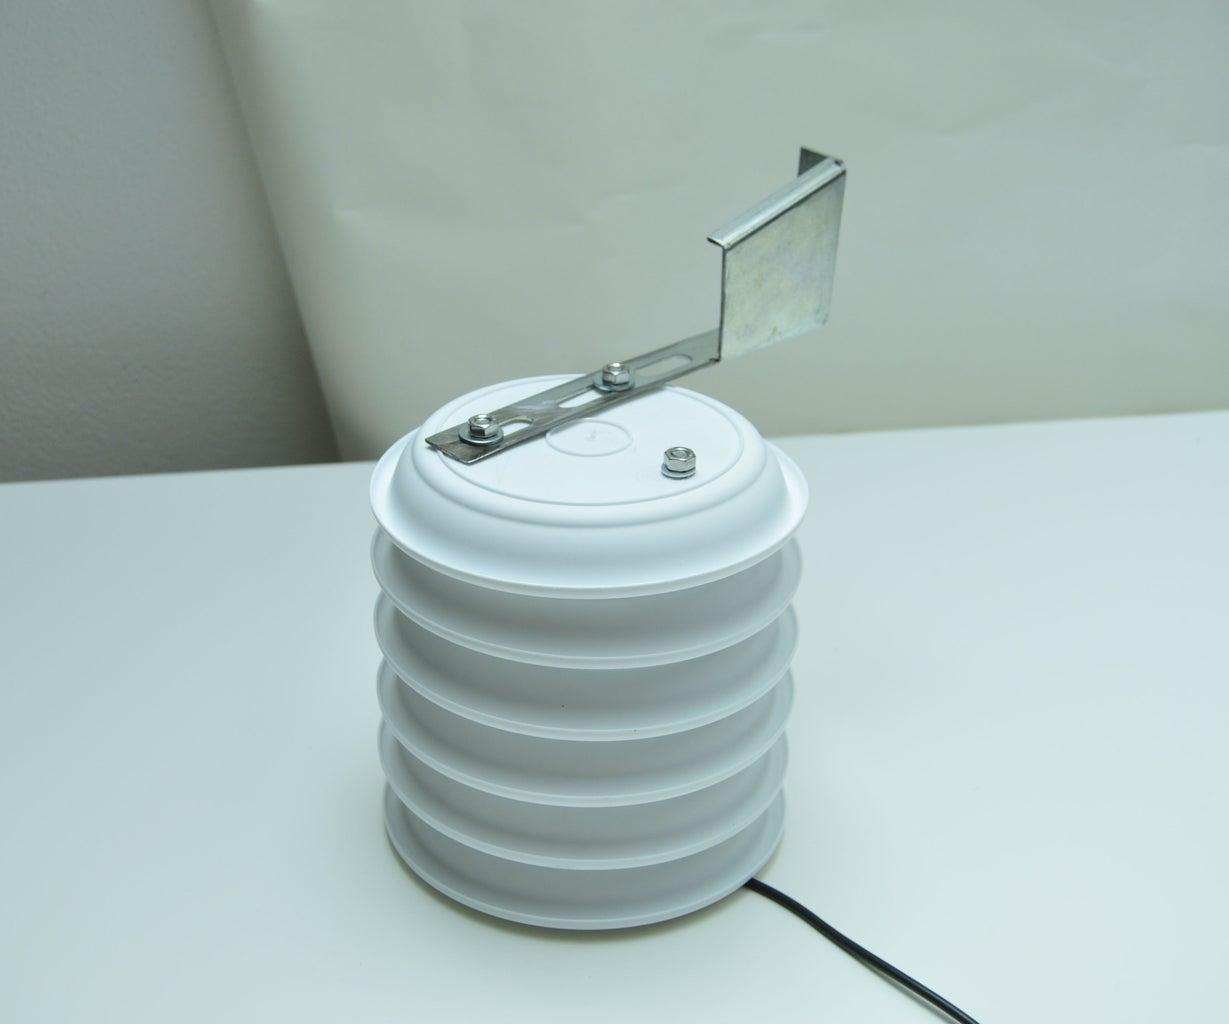 Making the Radiation Shield